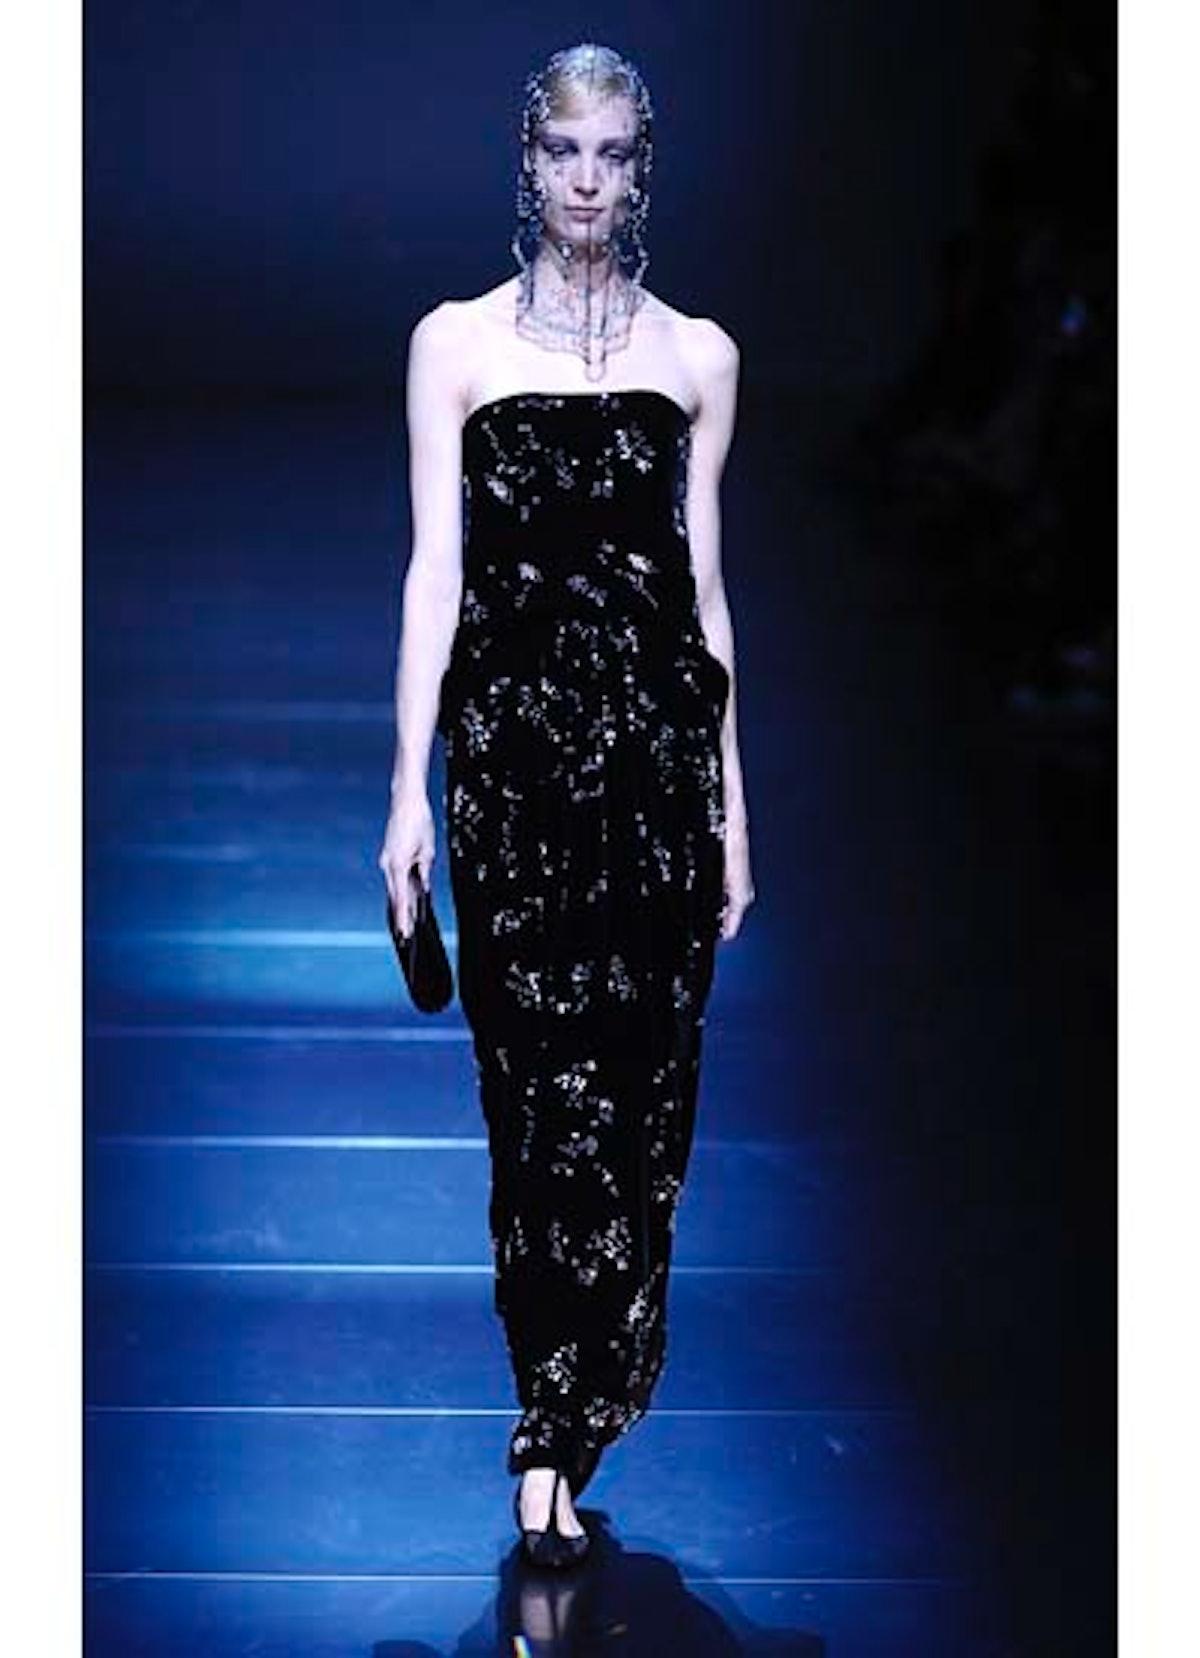 fass-giorgio-armani-couture-2012-runway-51-v.jpg